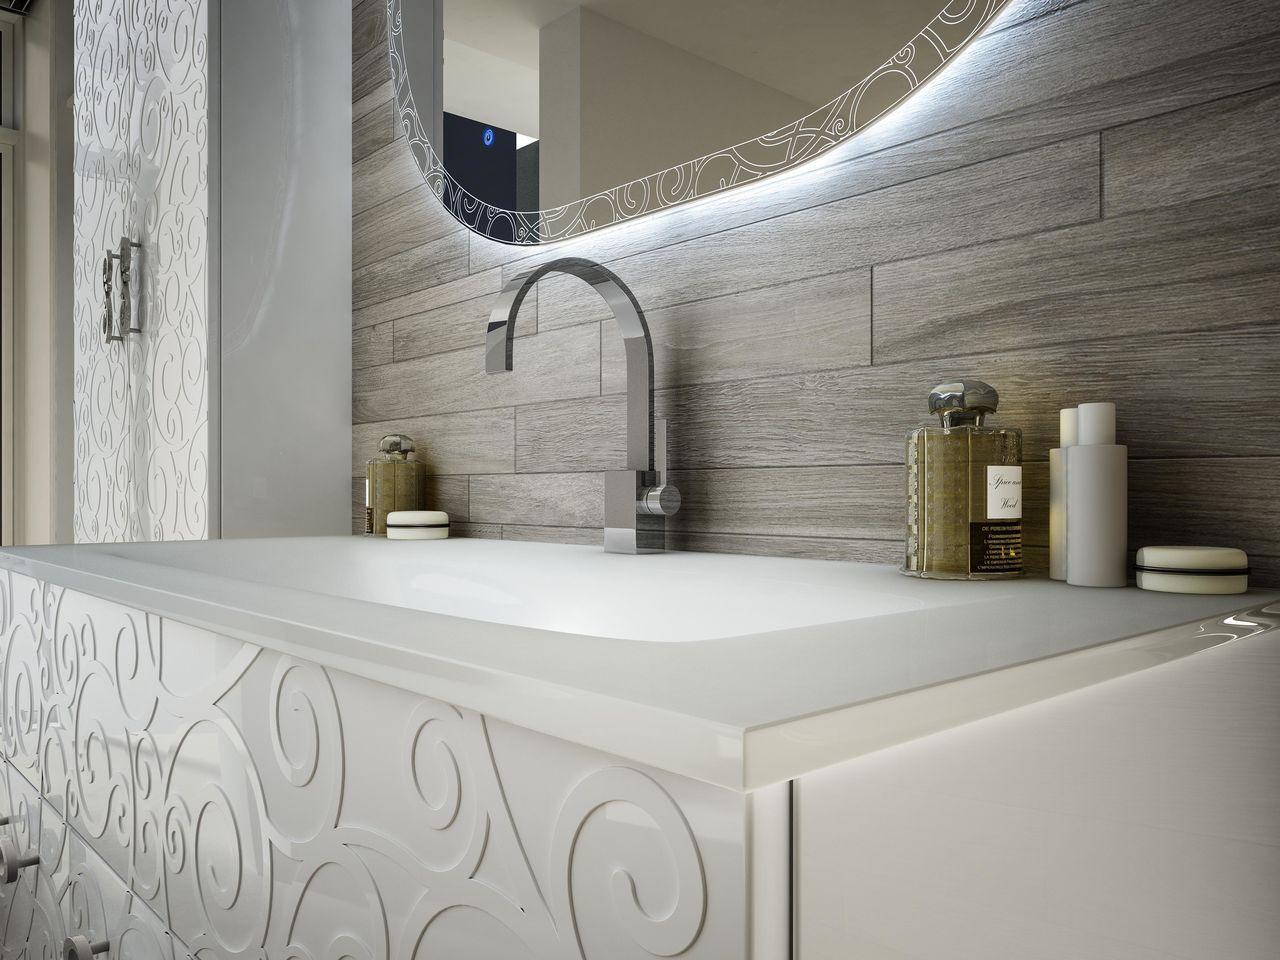 Mobile arredo da bagno milos sospeso 100 cm bianco nero - Come spiare in bagno ...